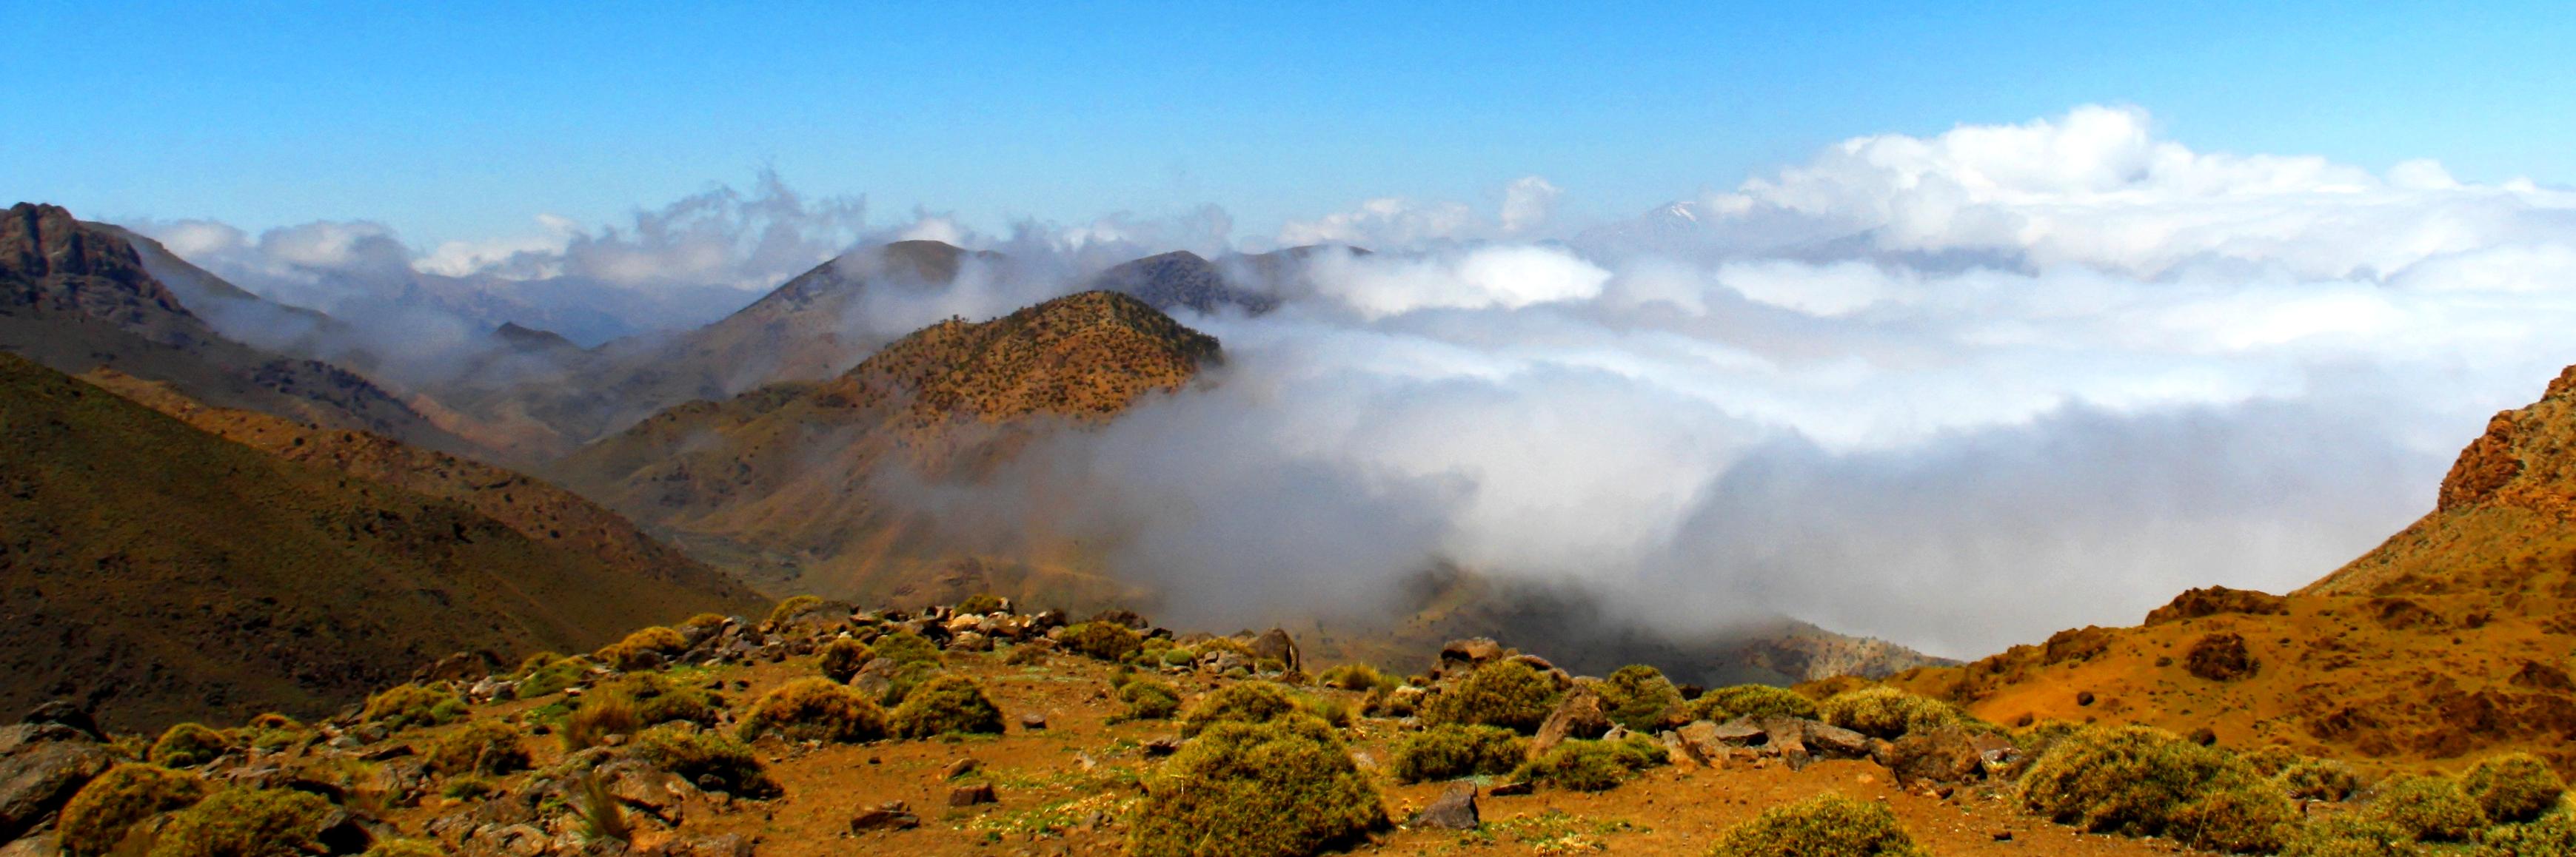 marokko-atlasgebirge